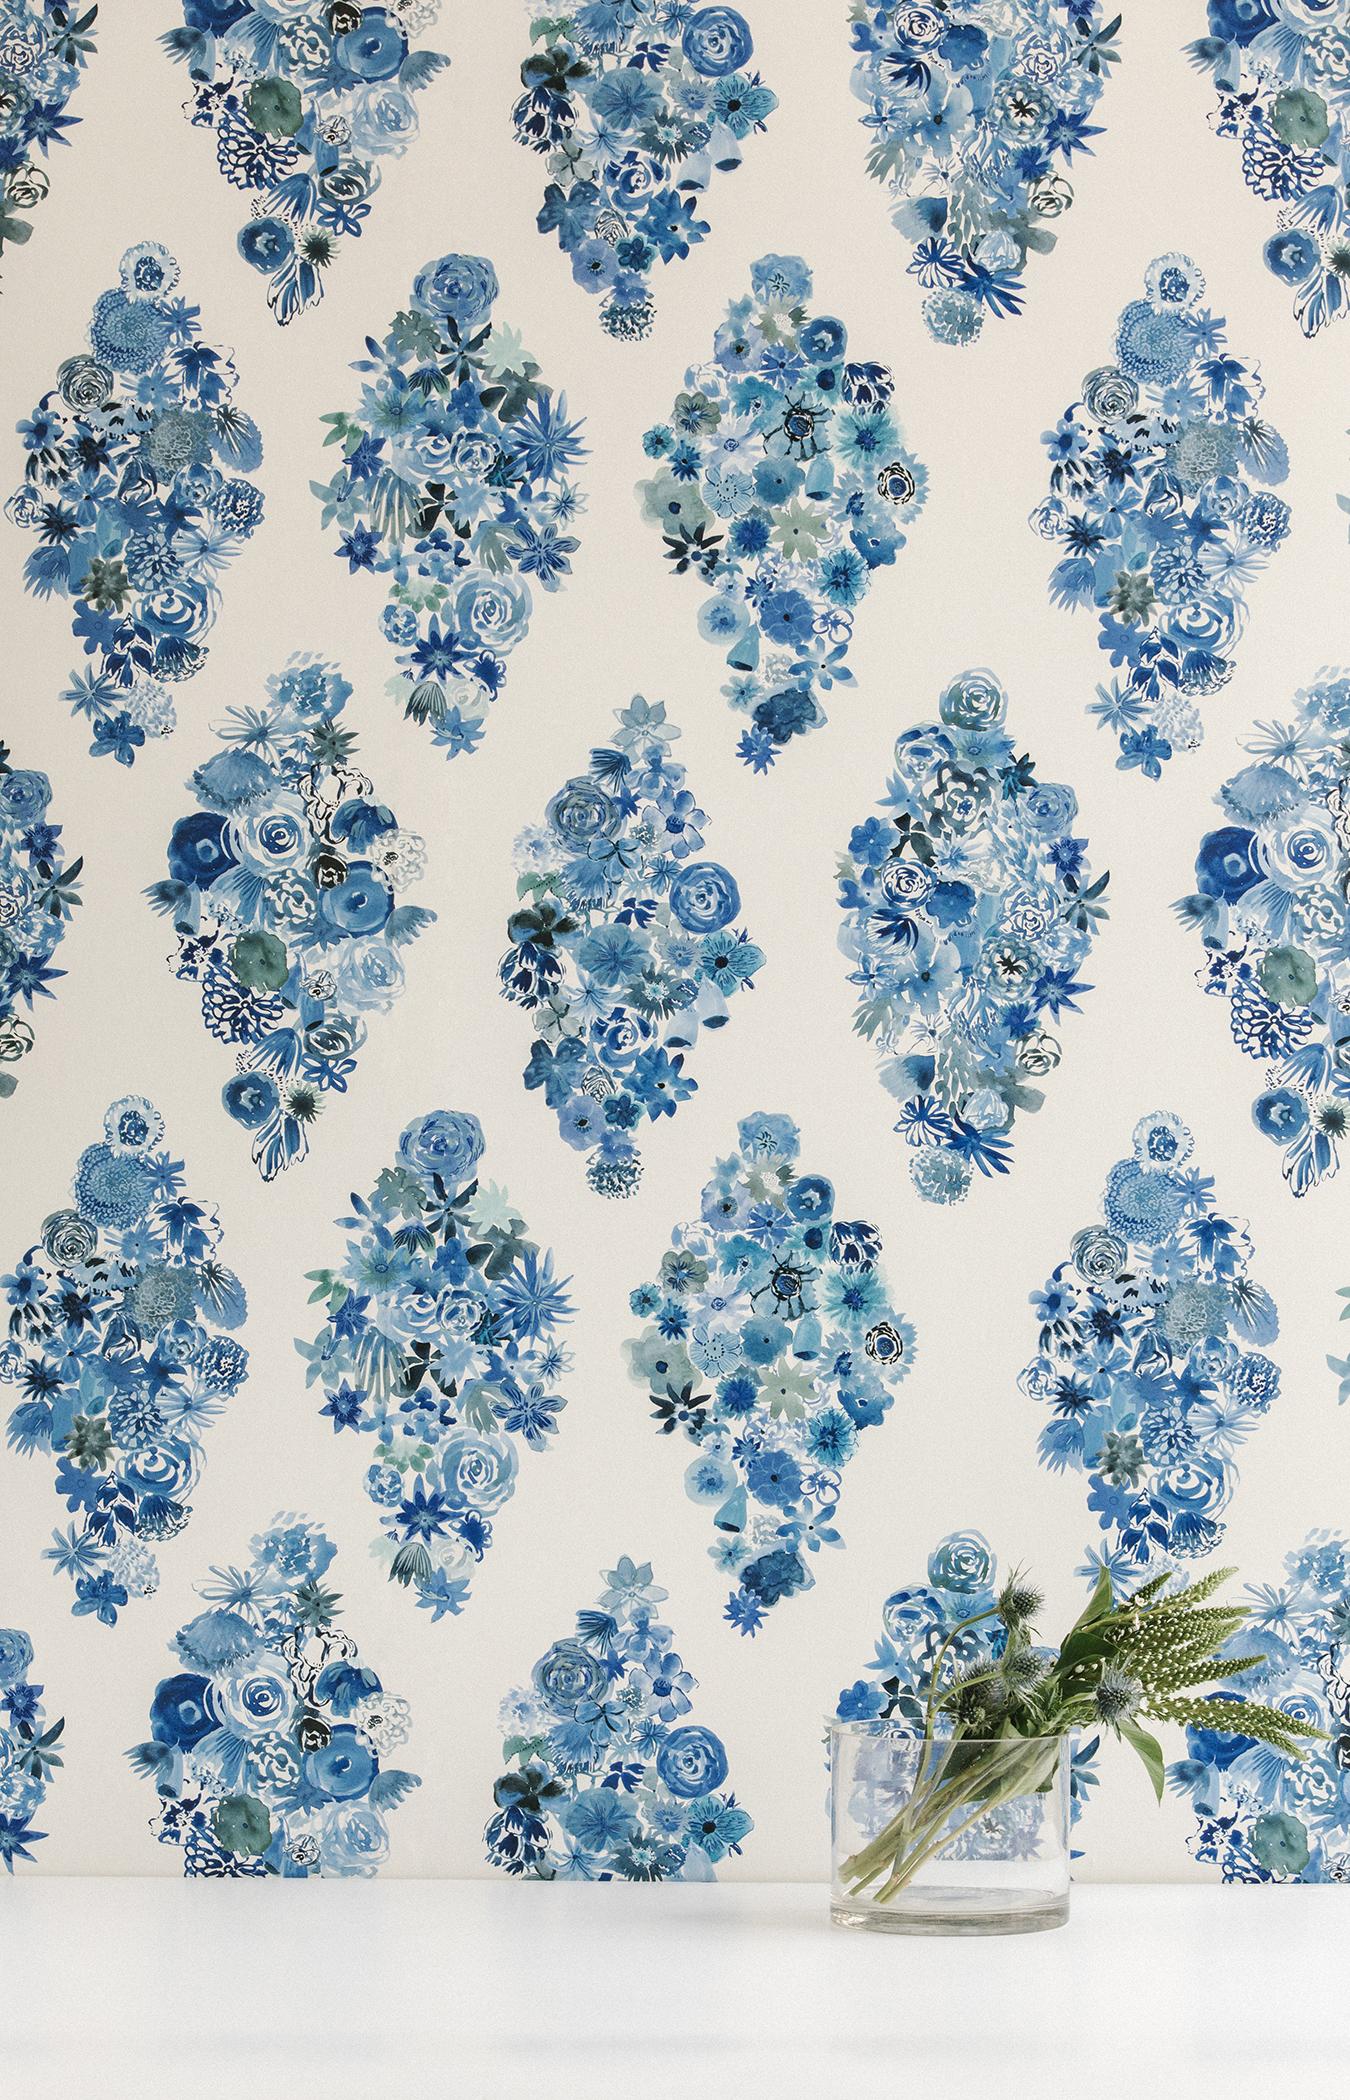 Flora Casbah Blue Floral Wallpaper Modern Floral Wallpaper